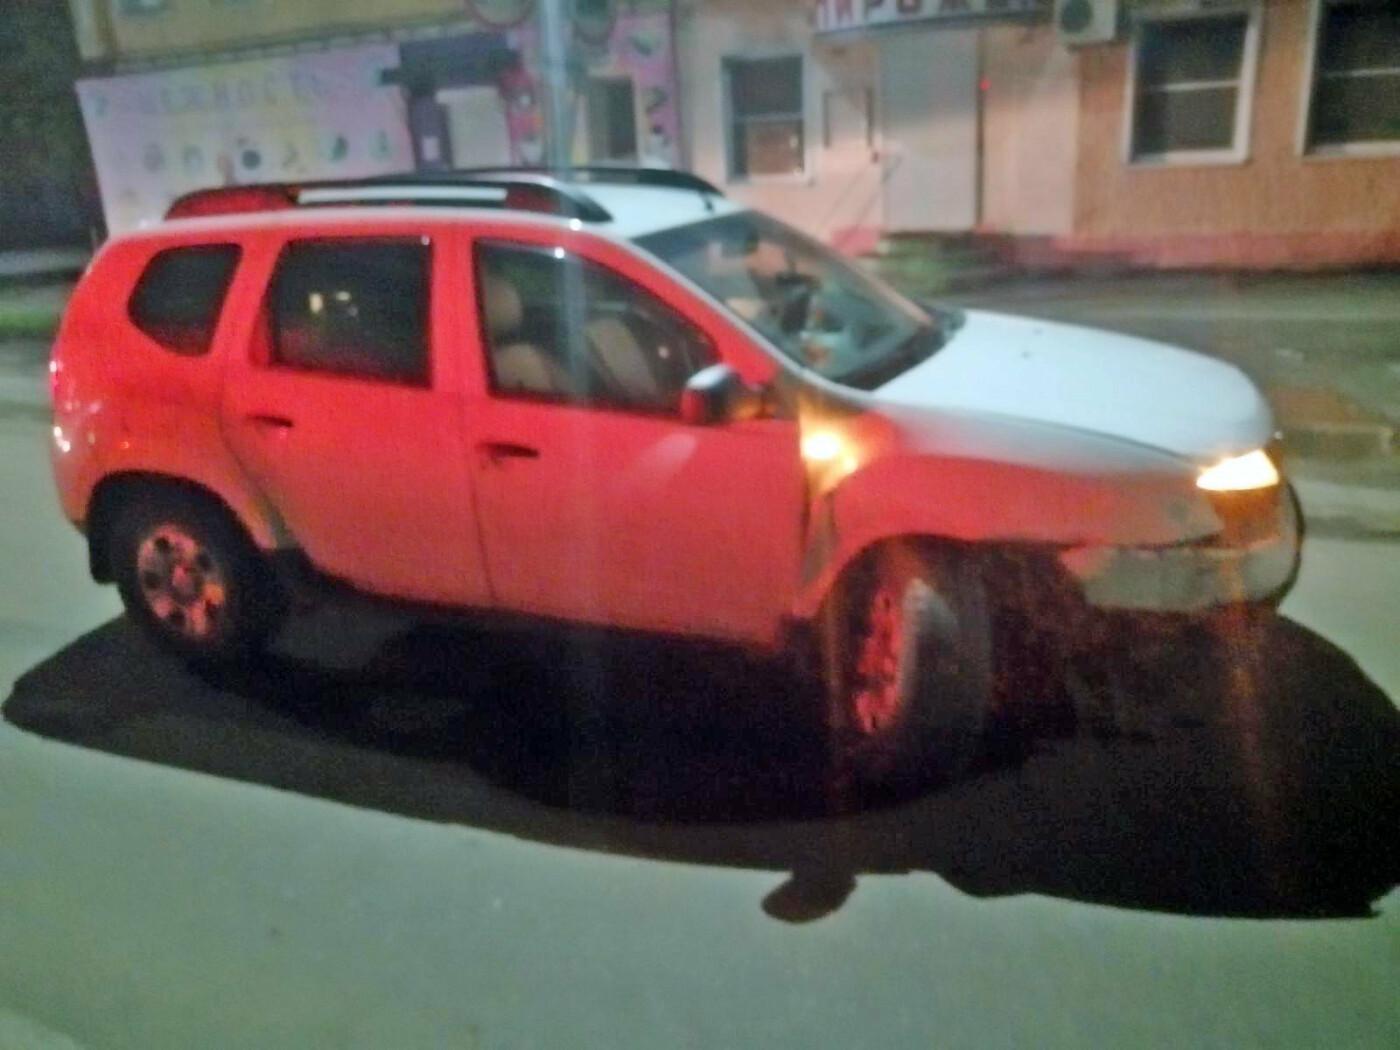 В Моршанске при столкновении иномарок пострадали два человека, фото-1